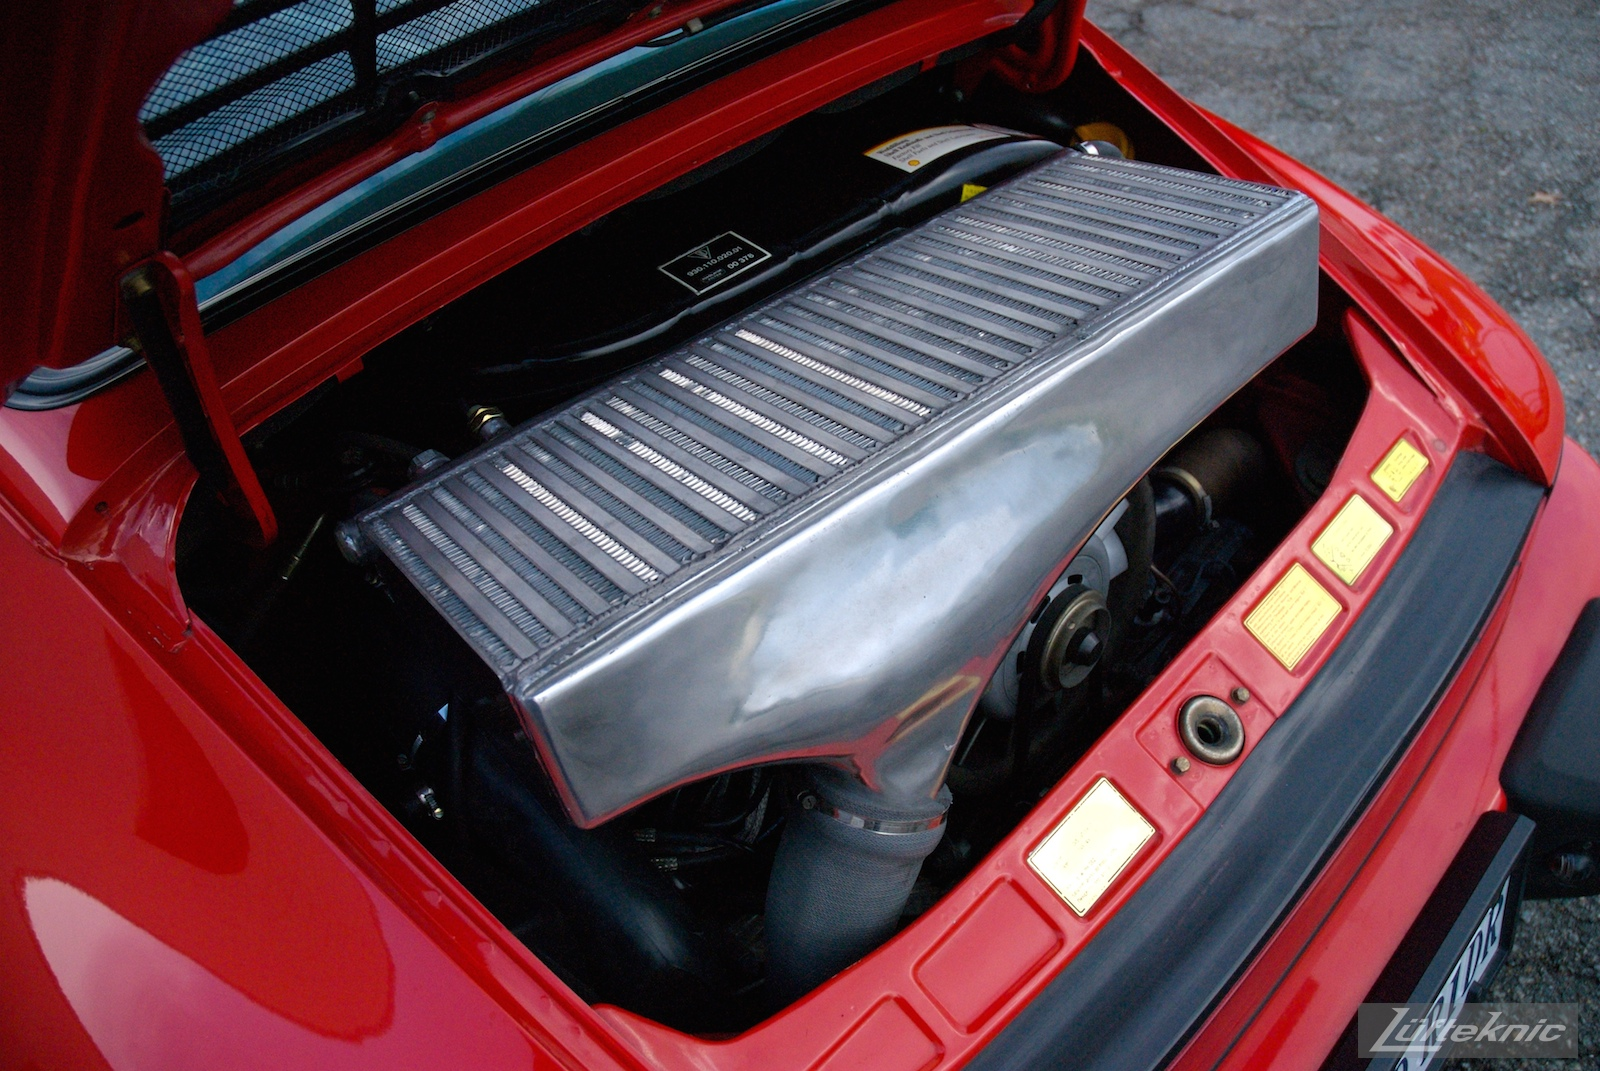 Red Porsche 930 Turbo intercooler.